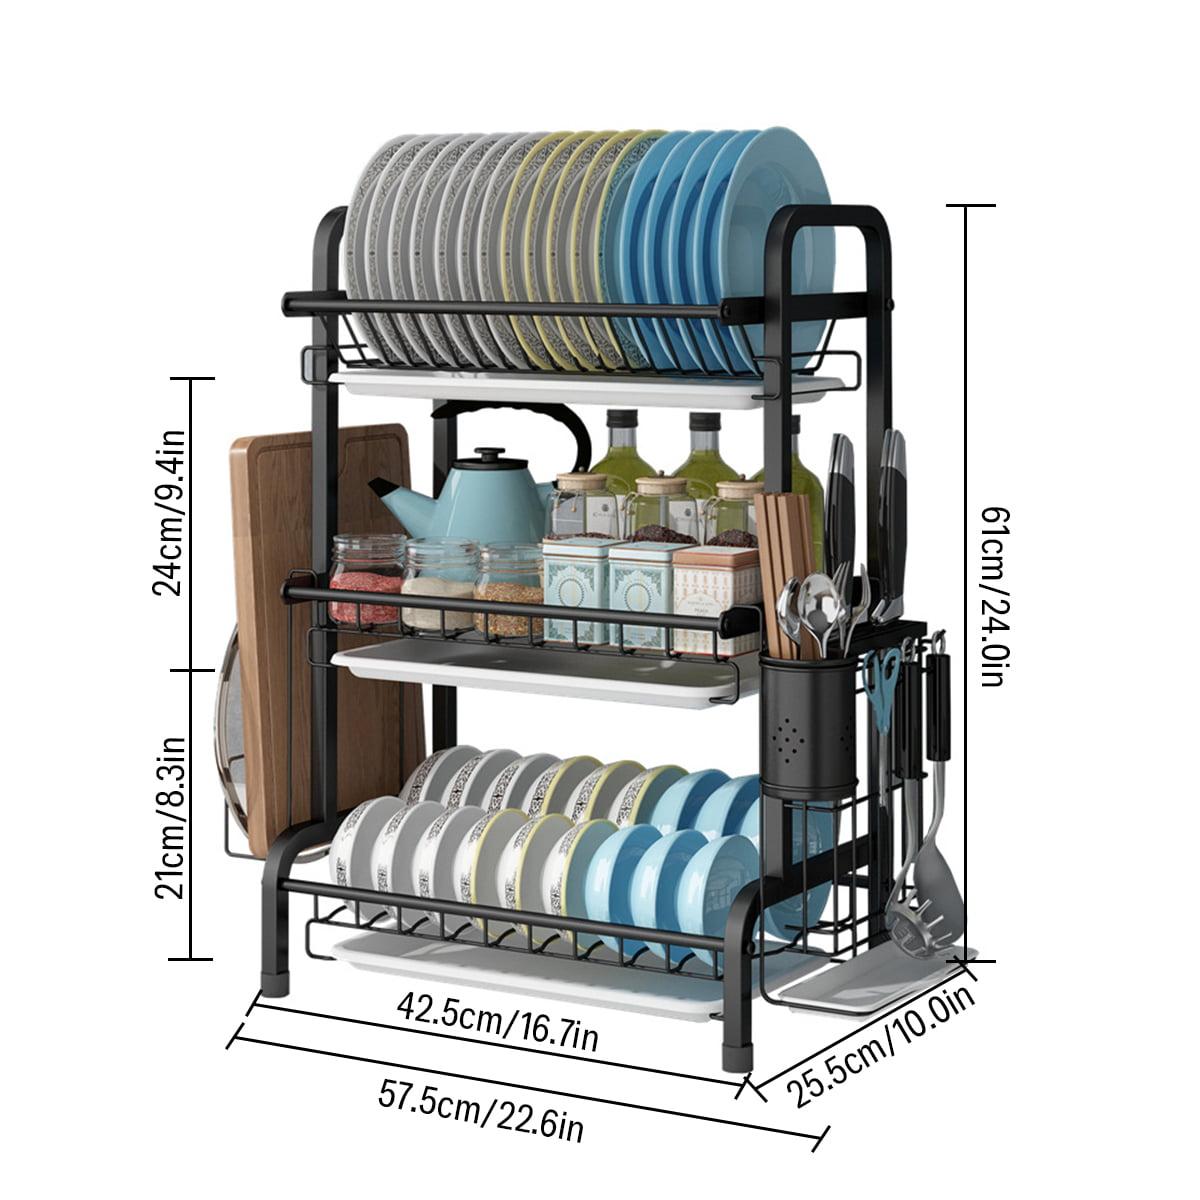 3 Tier Dish Drying Rack Kitchen Storage Shelf Display Stand Drainer Utensils Holder Stainless Steel Walmart Com Walmart Com